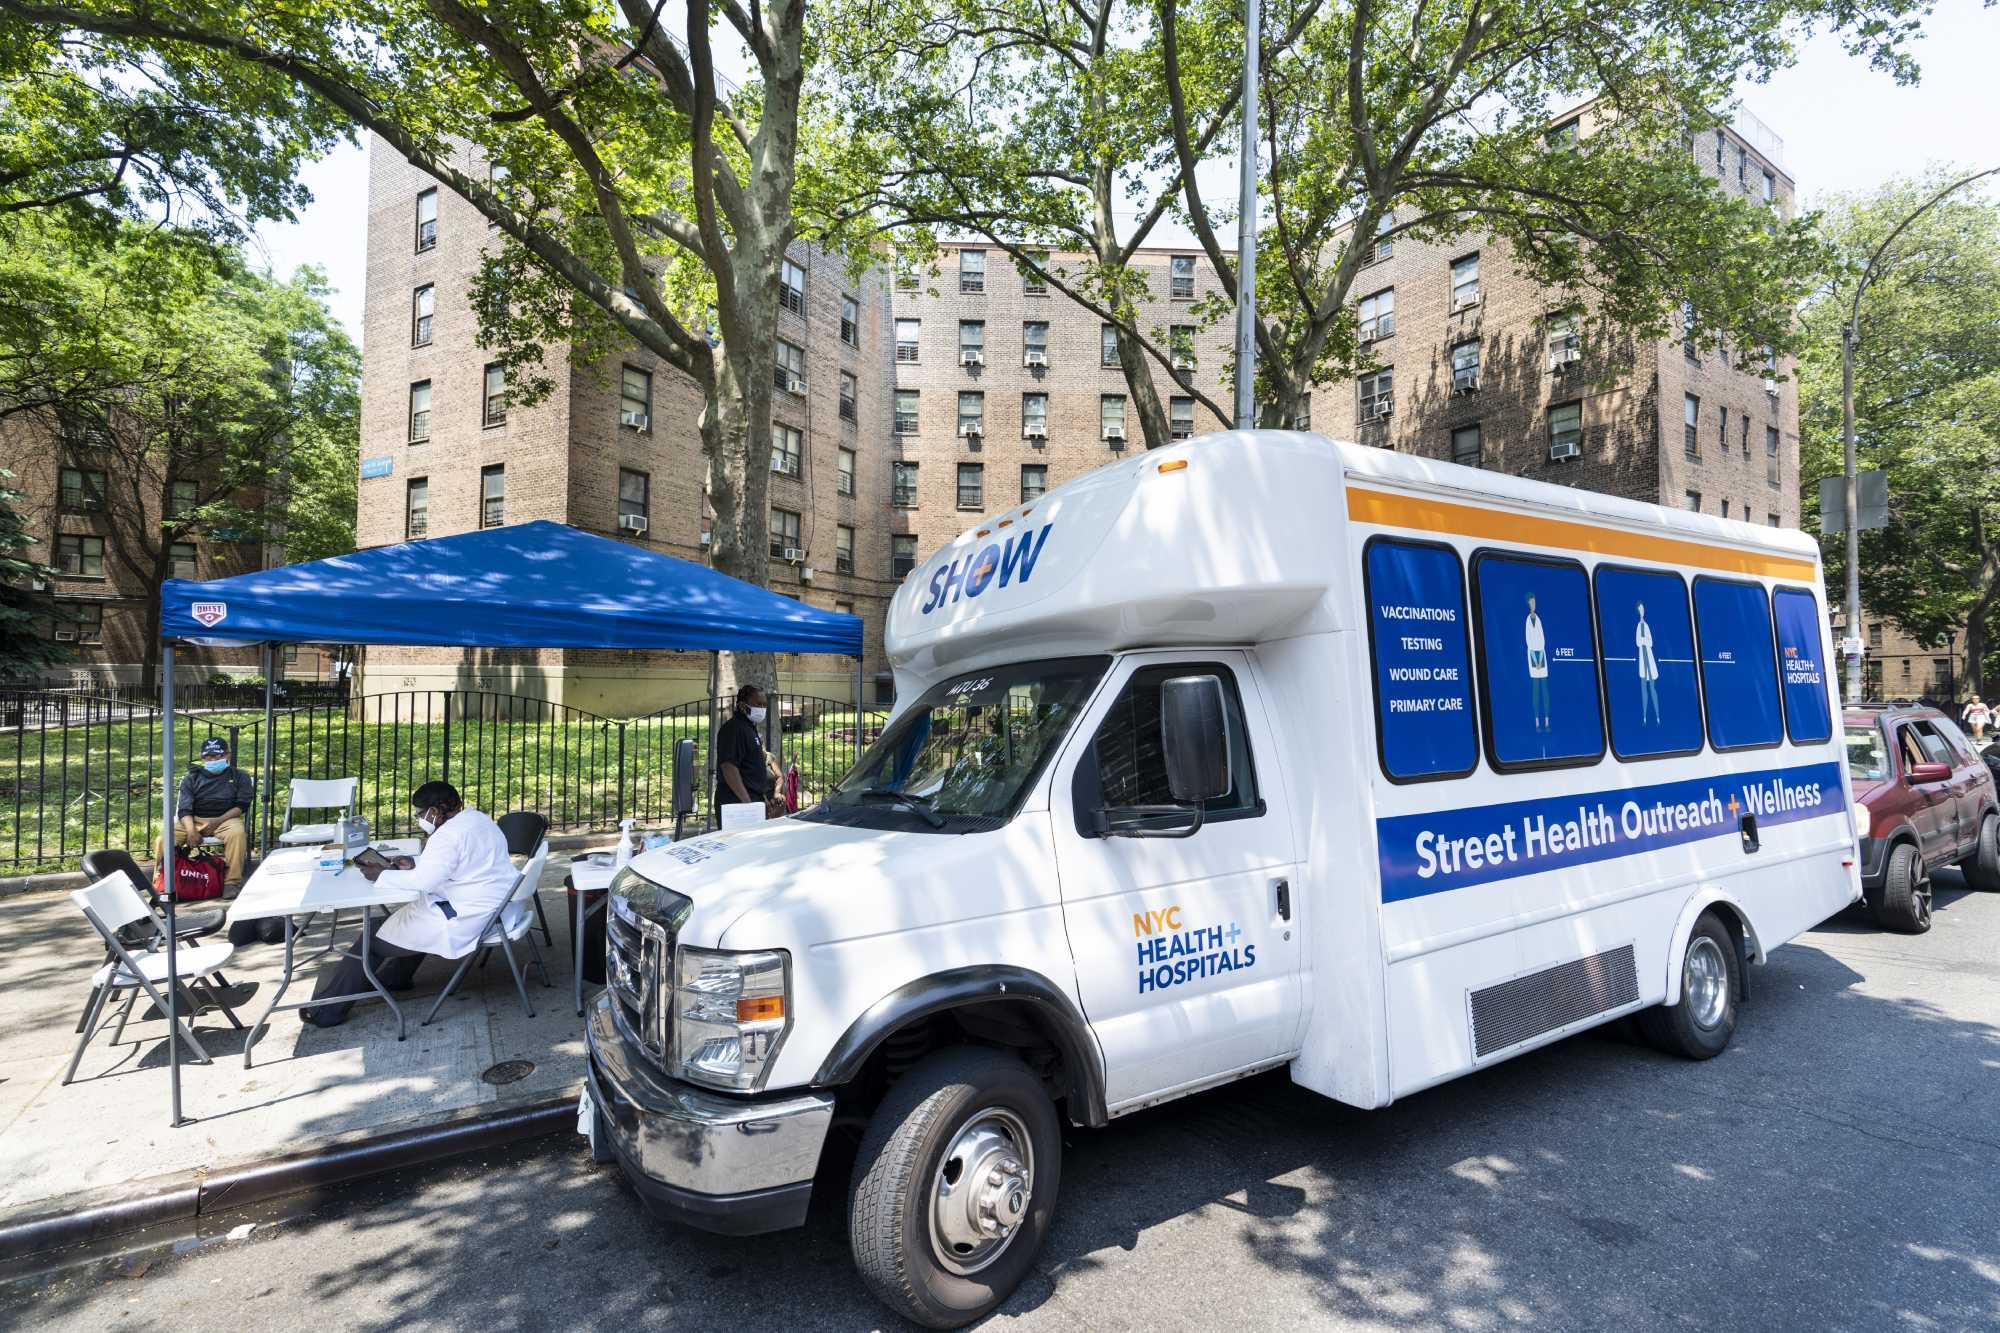 Street Health Outreach & Wellness Mobile Units